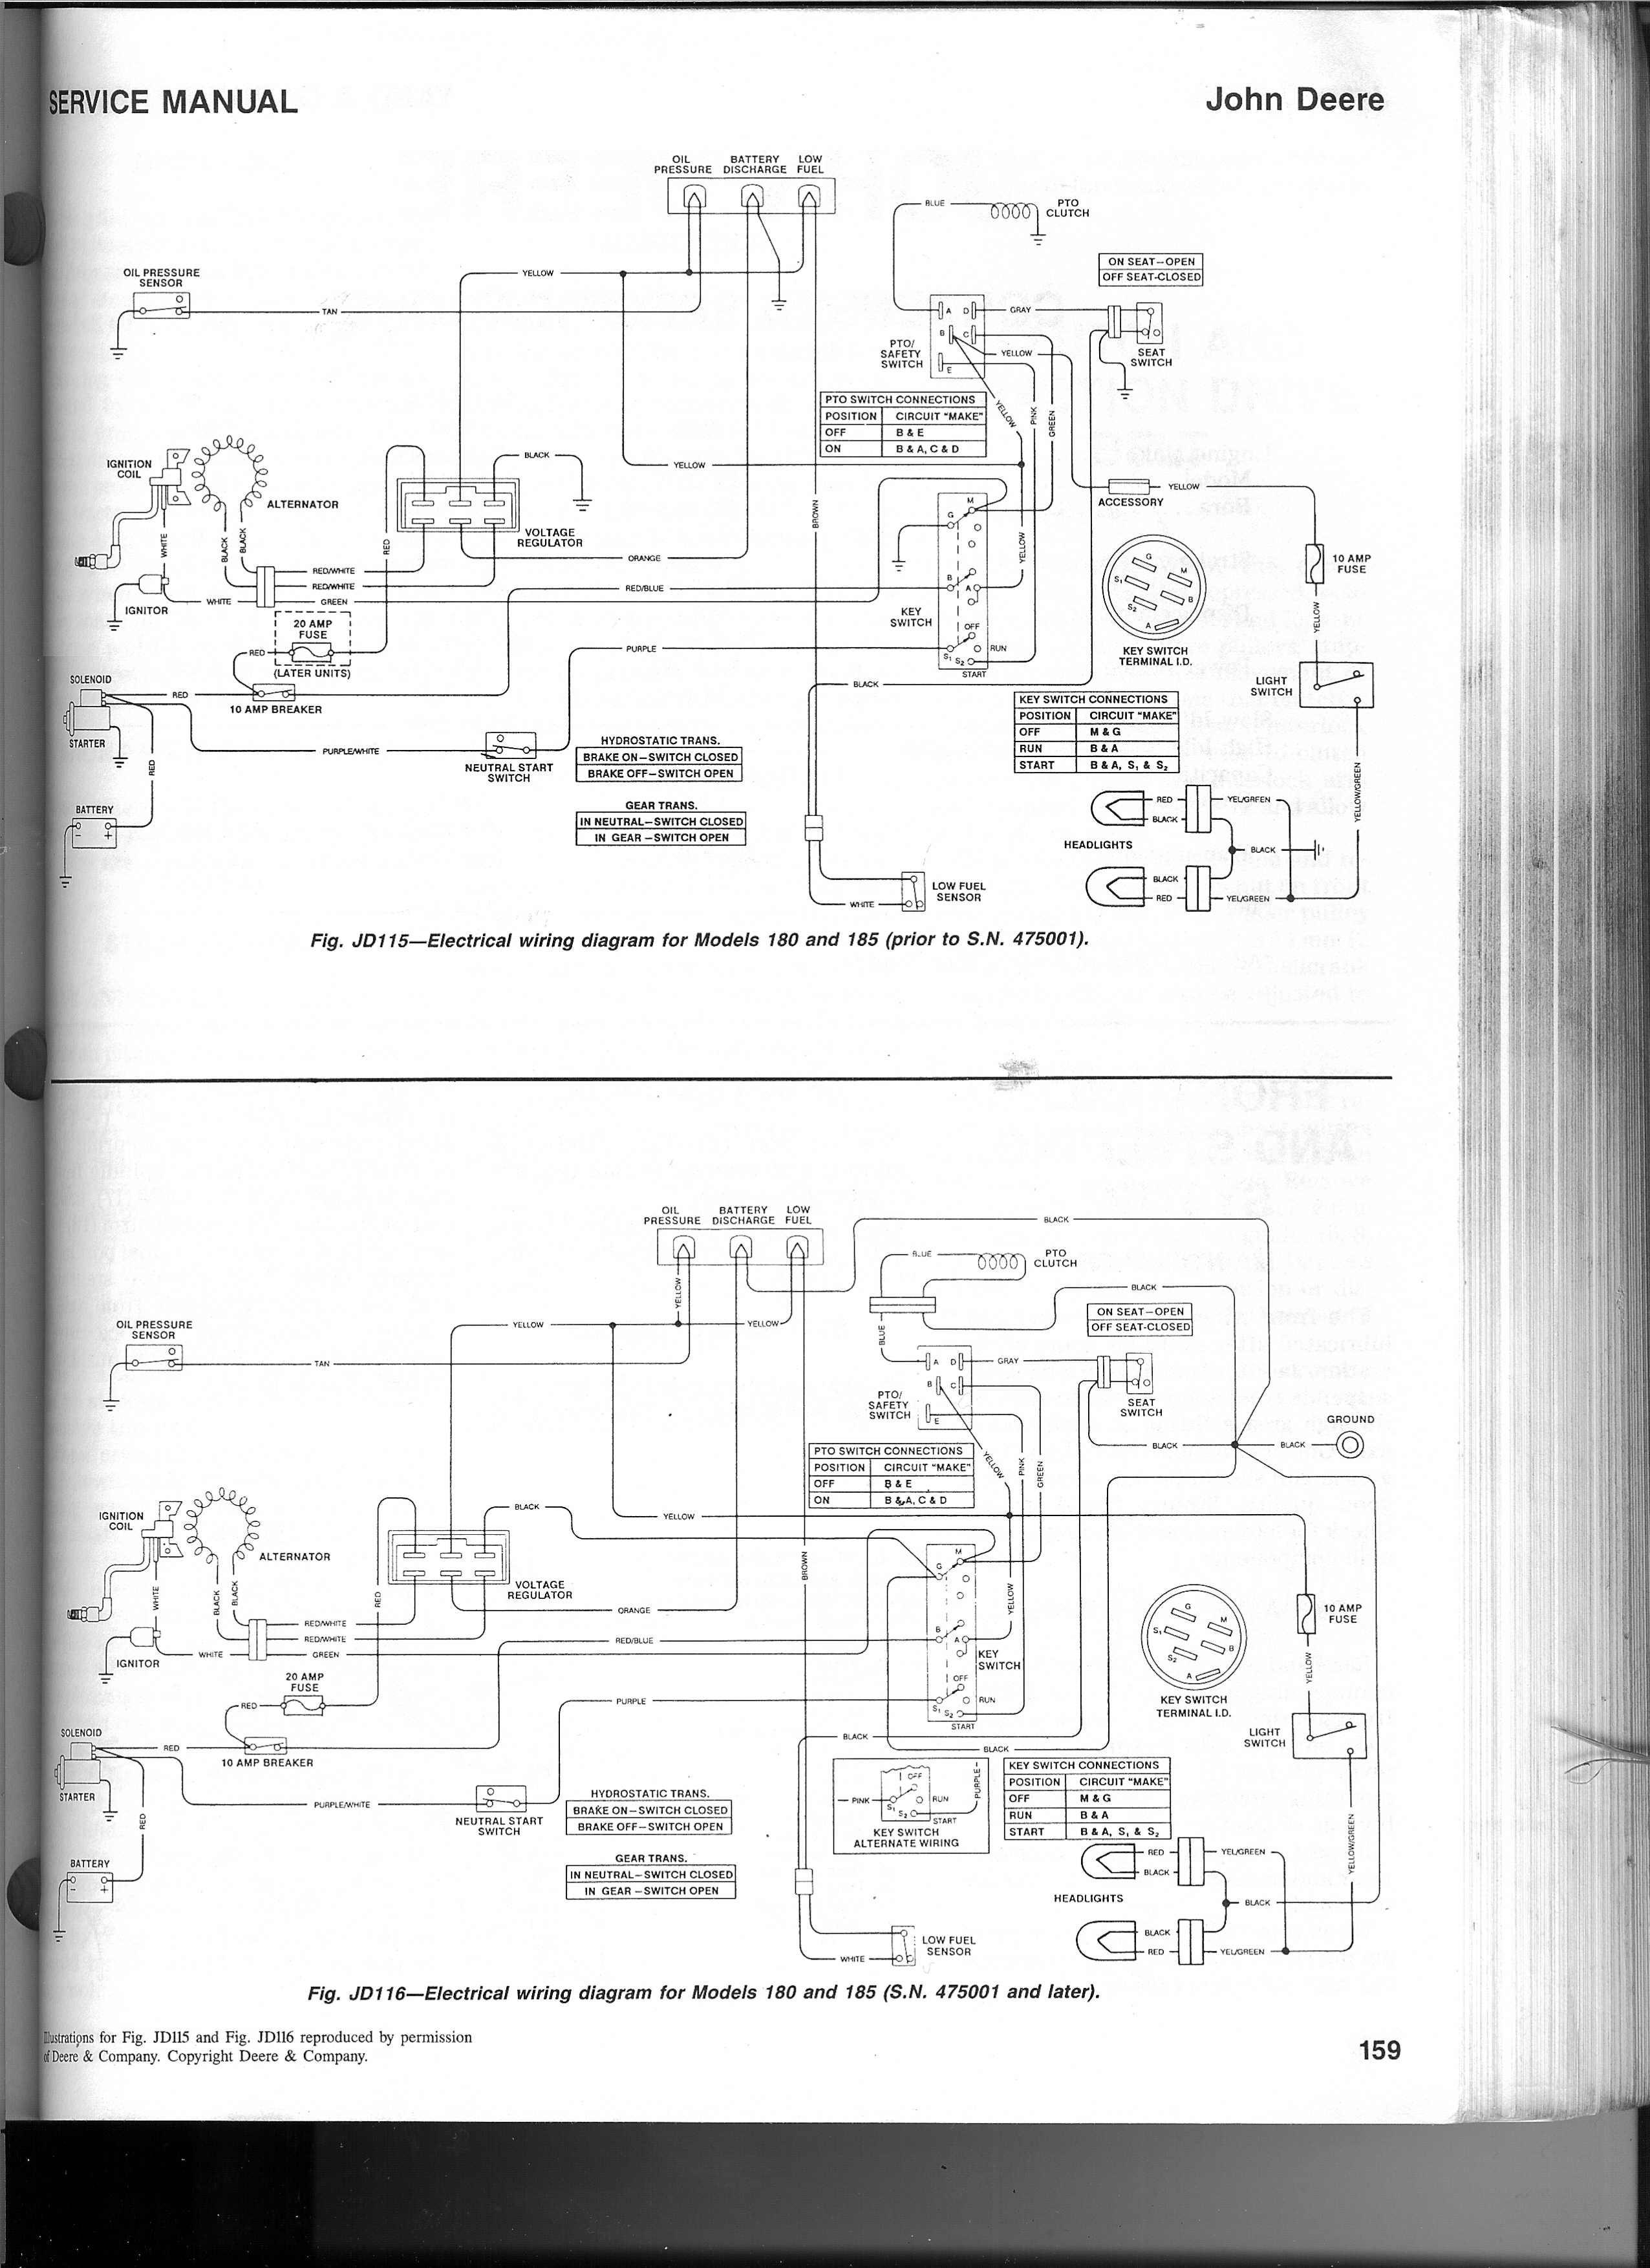 John Deere Gx345 Wiring Diagram Dh 6213] John Deere Gt235 Wiring Diagram for Free Further Of John Deere Gx345 Wiring Diagram